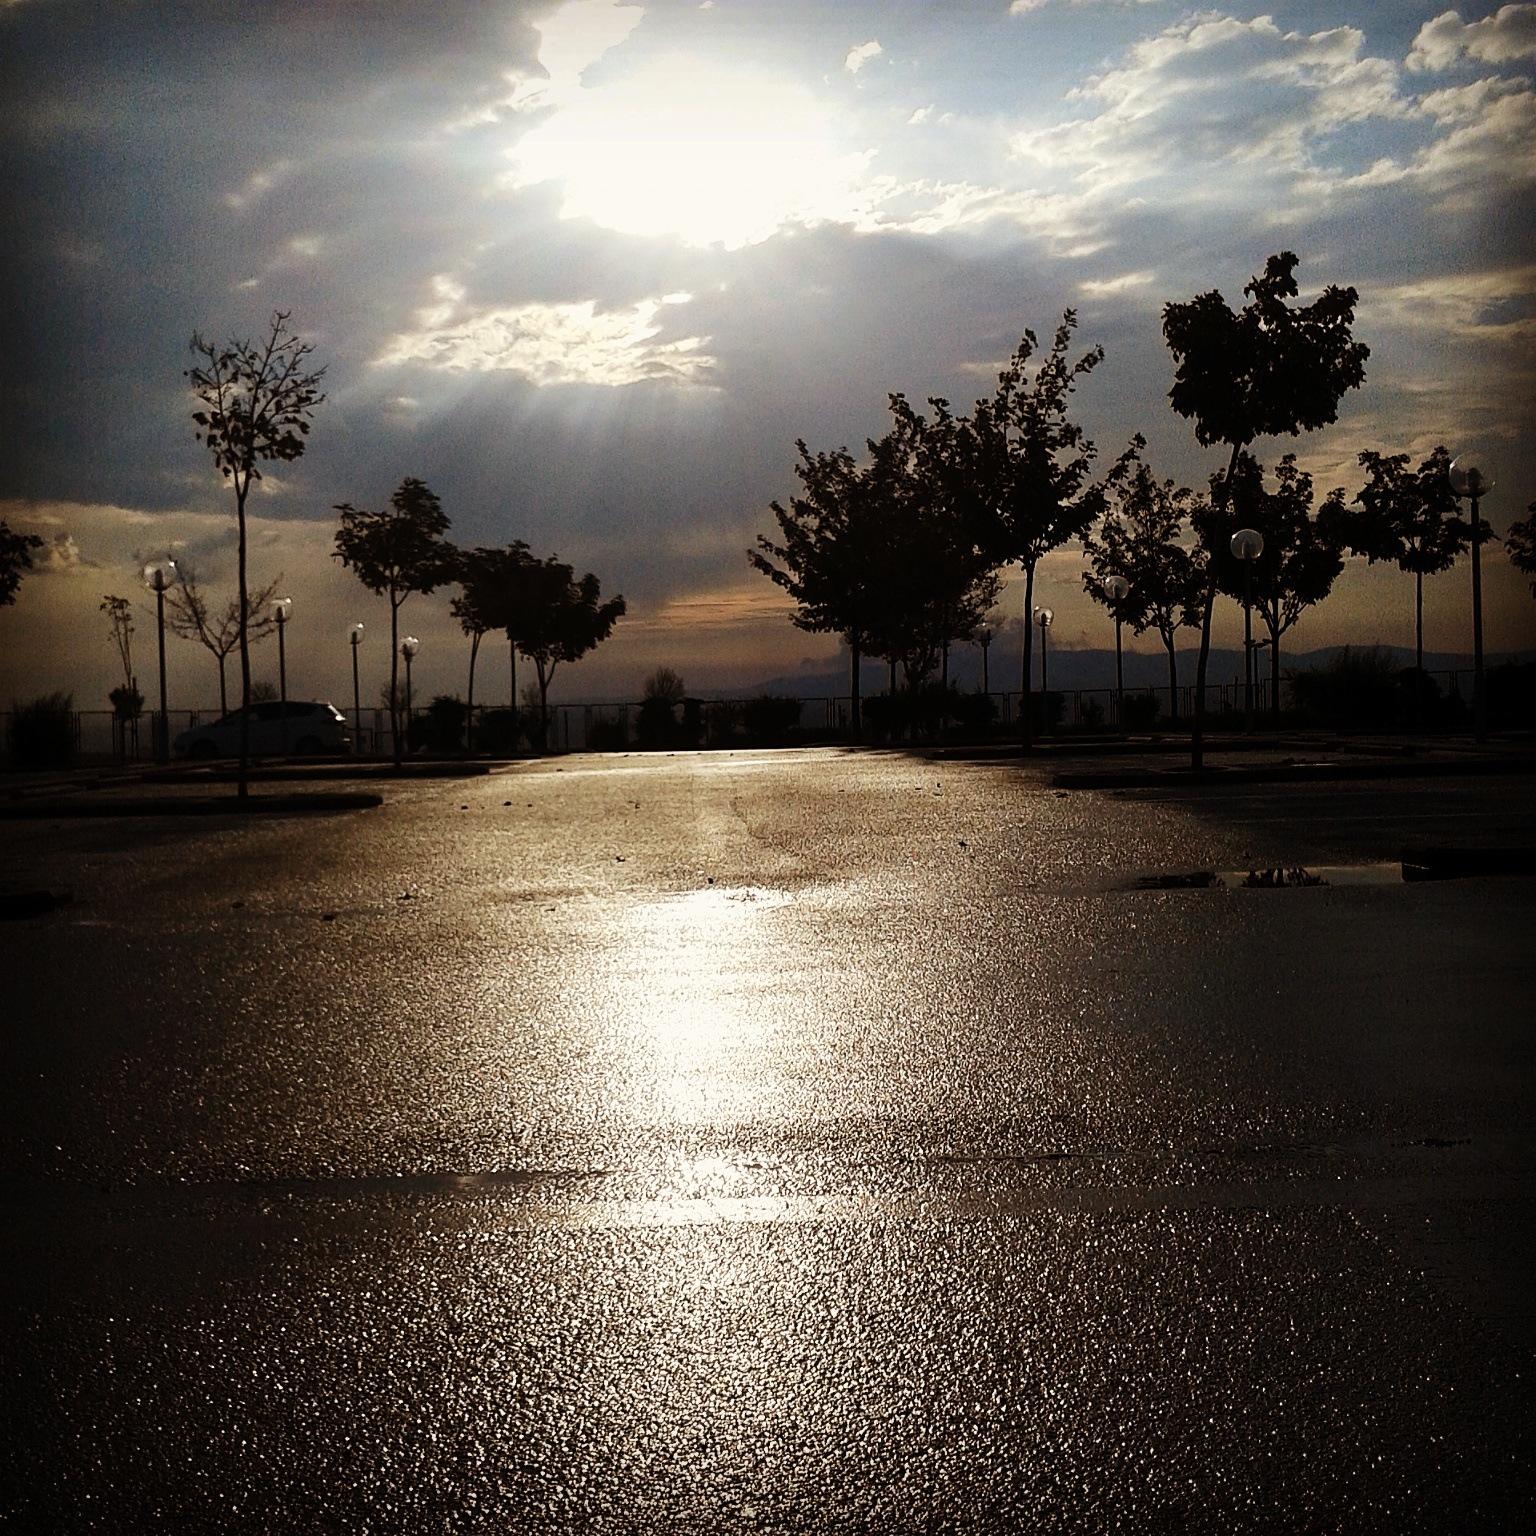 Sunrise by Bülent Aydın